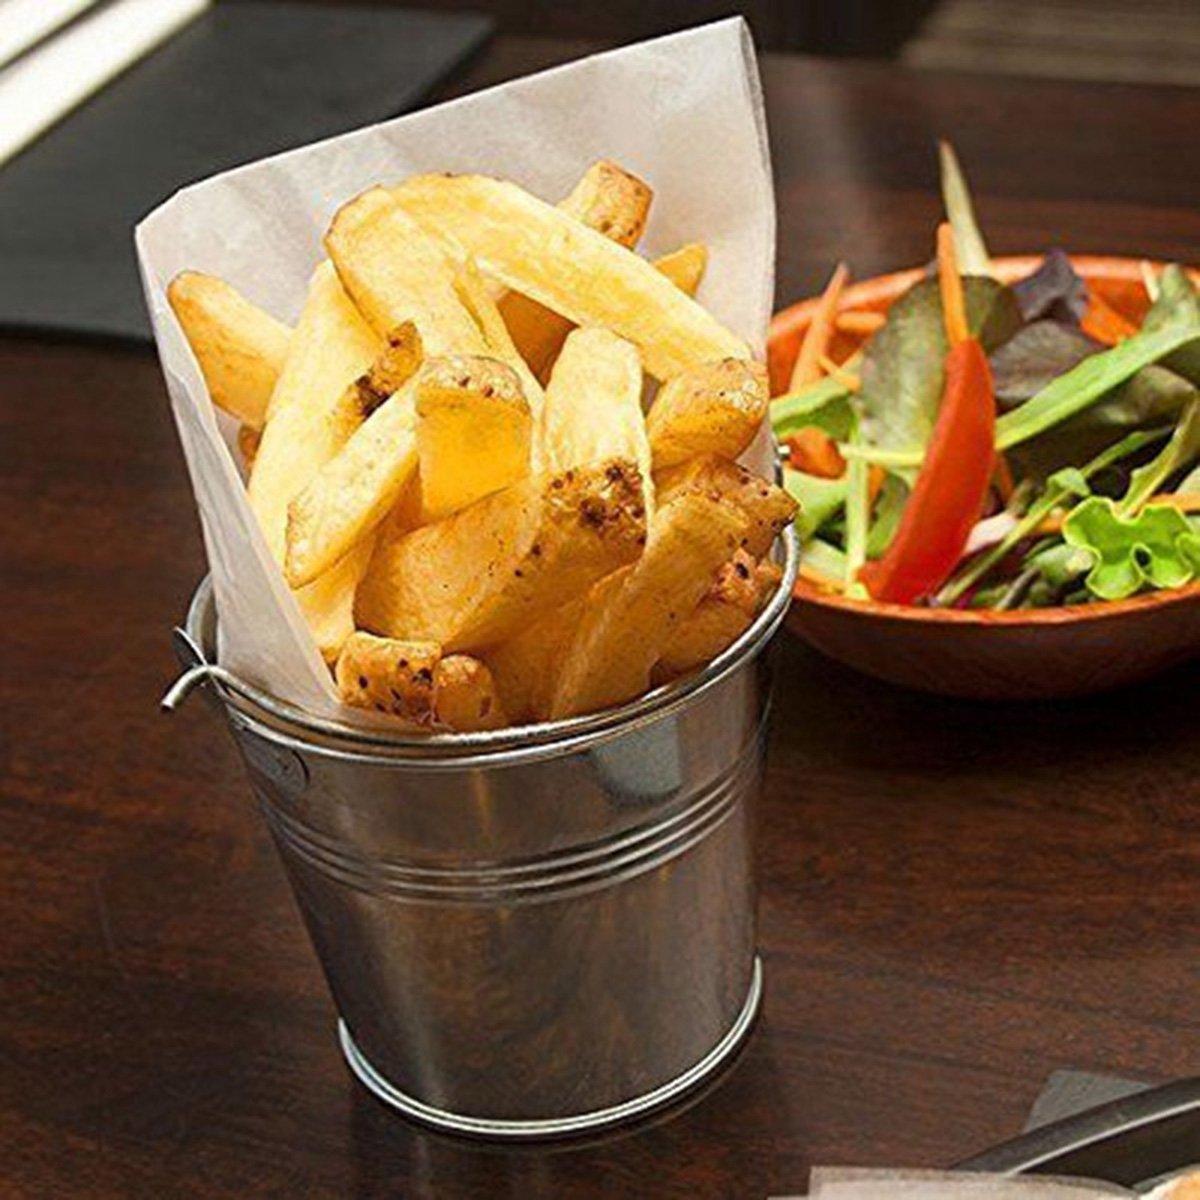 OUNONA Mini Metal Bucket Set of 6 /Mini Food Containers/Succulent Wedding Buckets 10.5x7.2x10.5cm by OUNONA (Image #2)